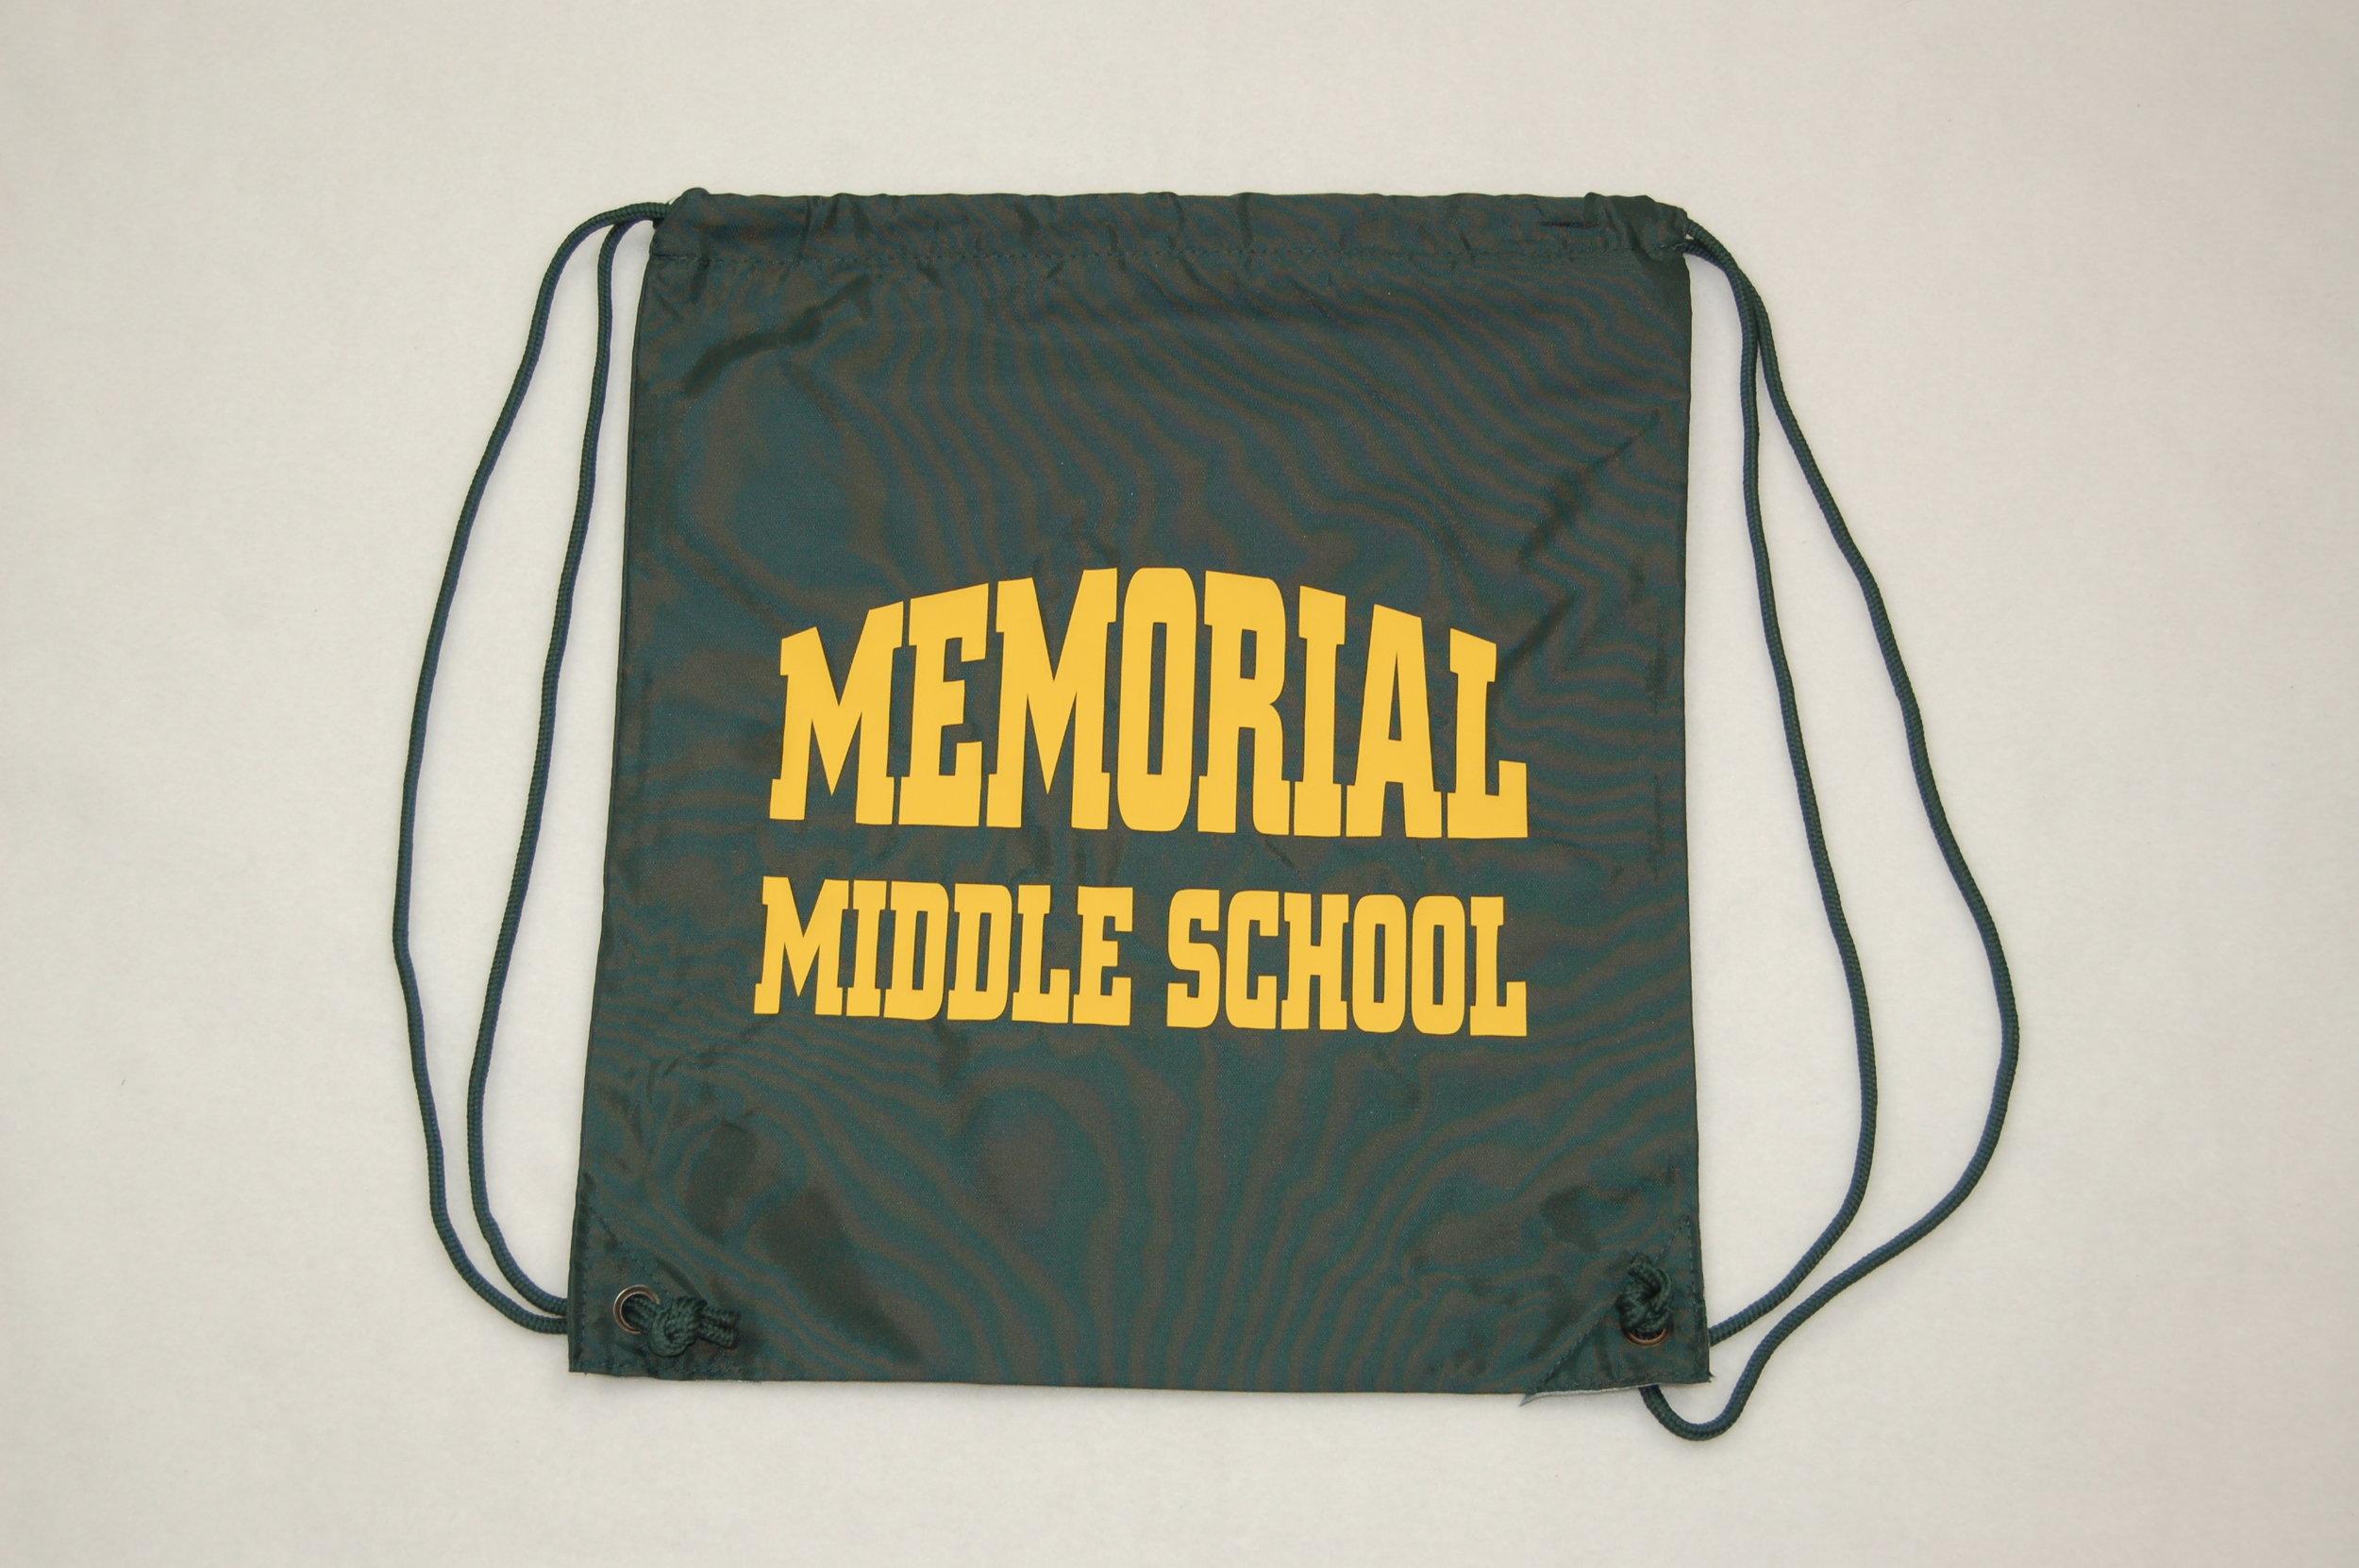 Memorial Middle School string bag.